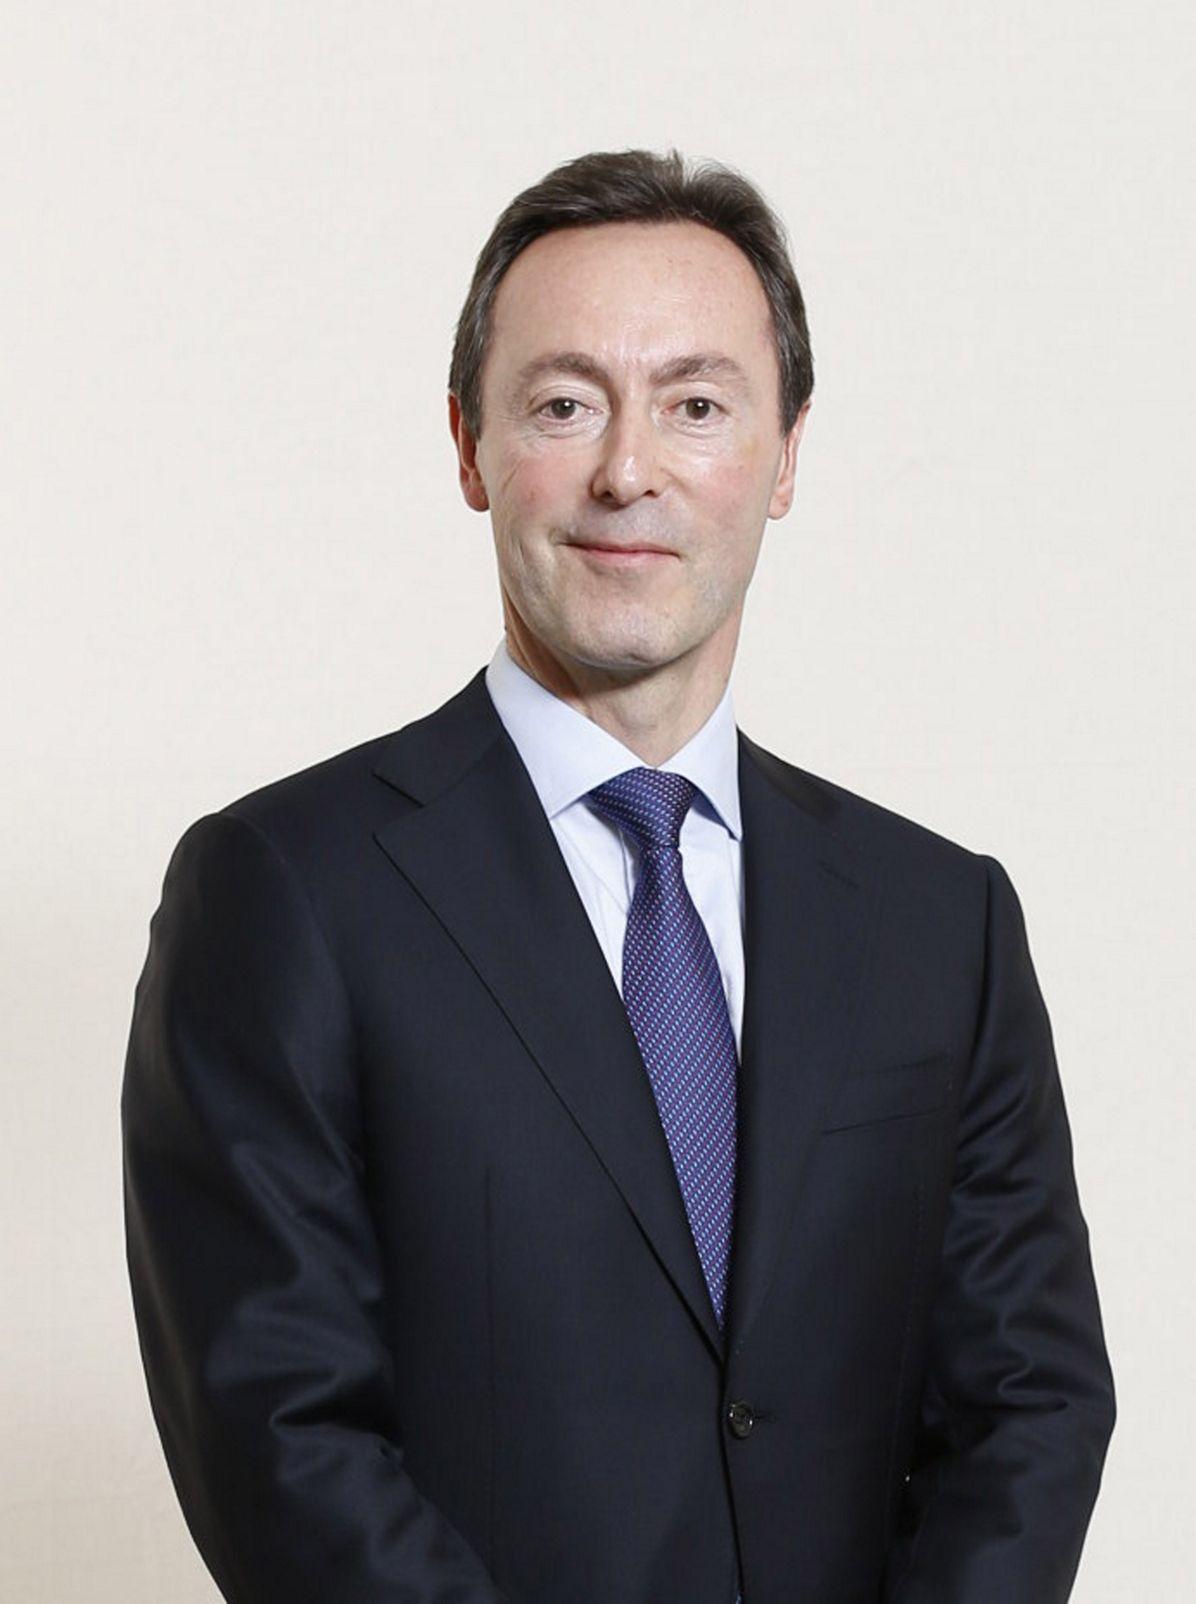 Fabrice Brégier